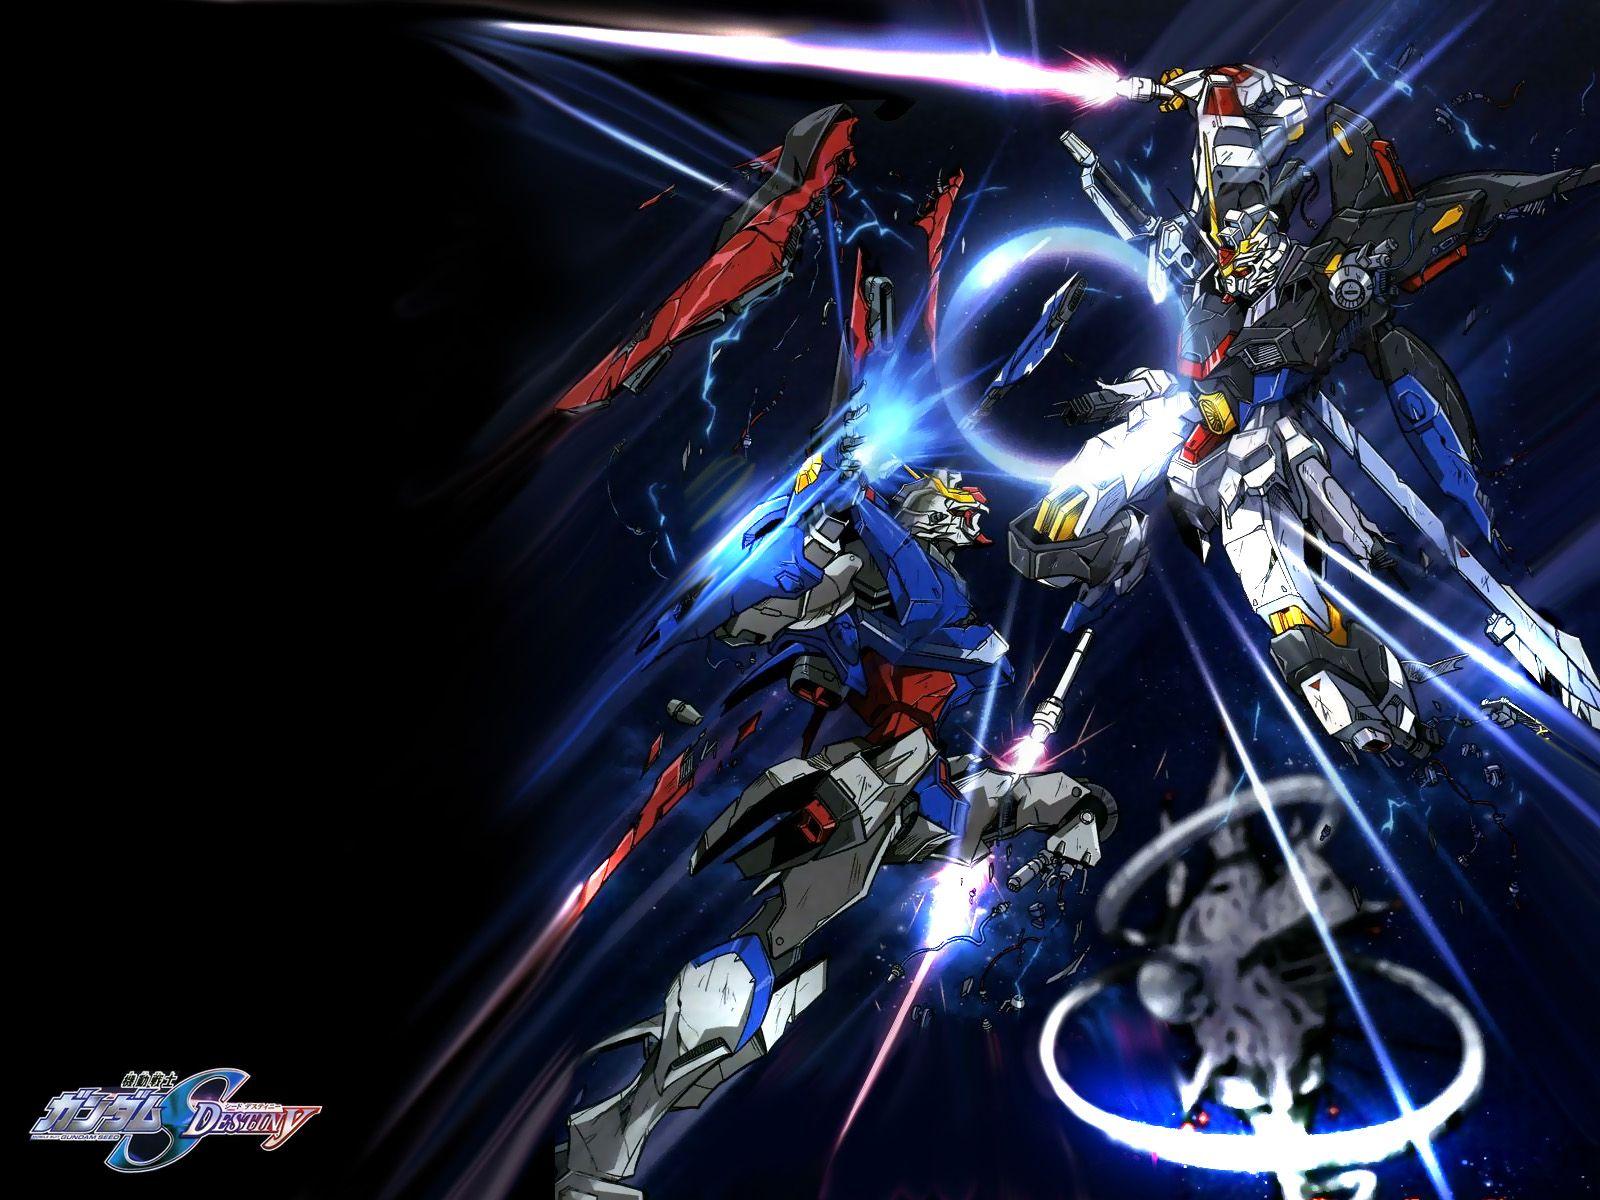 Gundam Seed Destiny Wallpapers ガンダムseed ガンダム 機動戦士